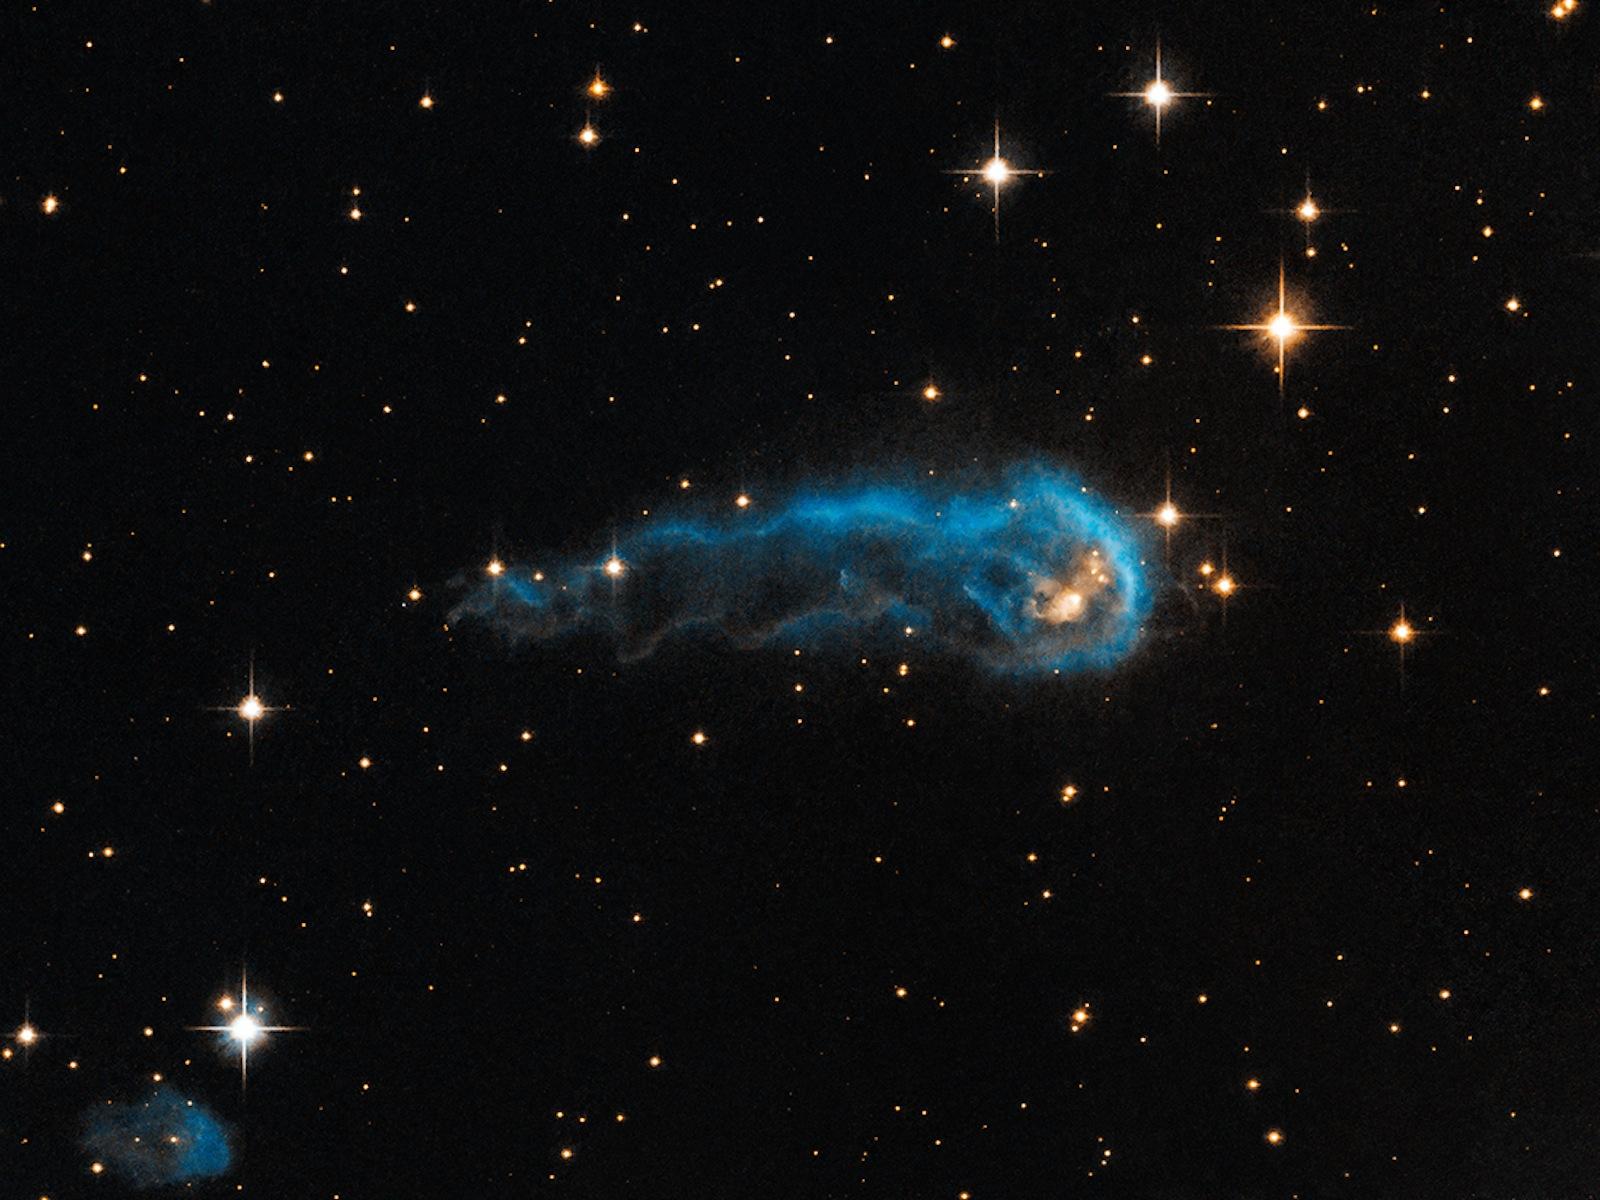 IRAS 20324 4057 Protostar